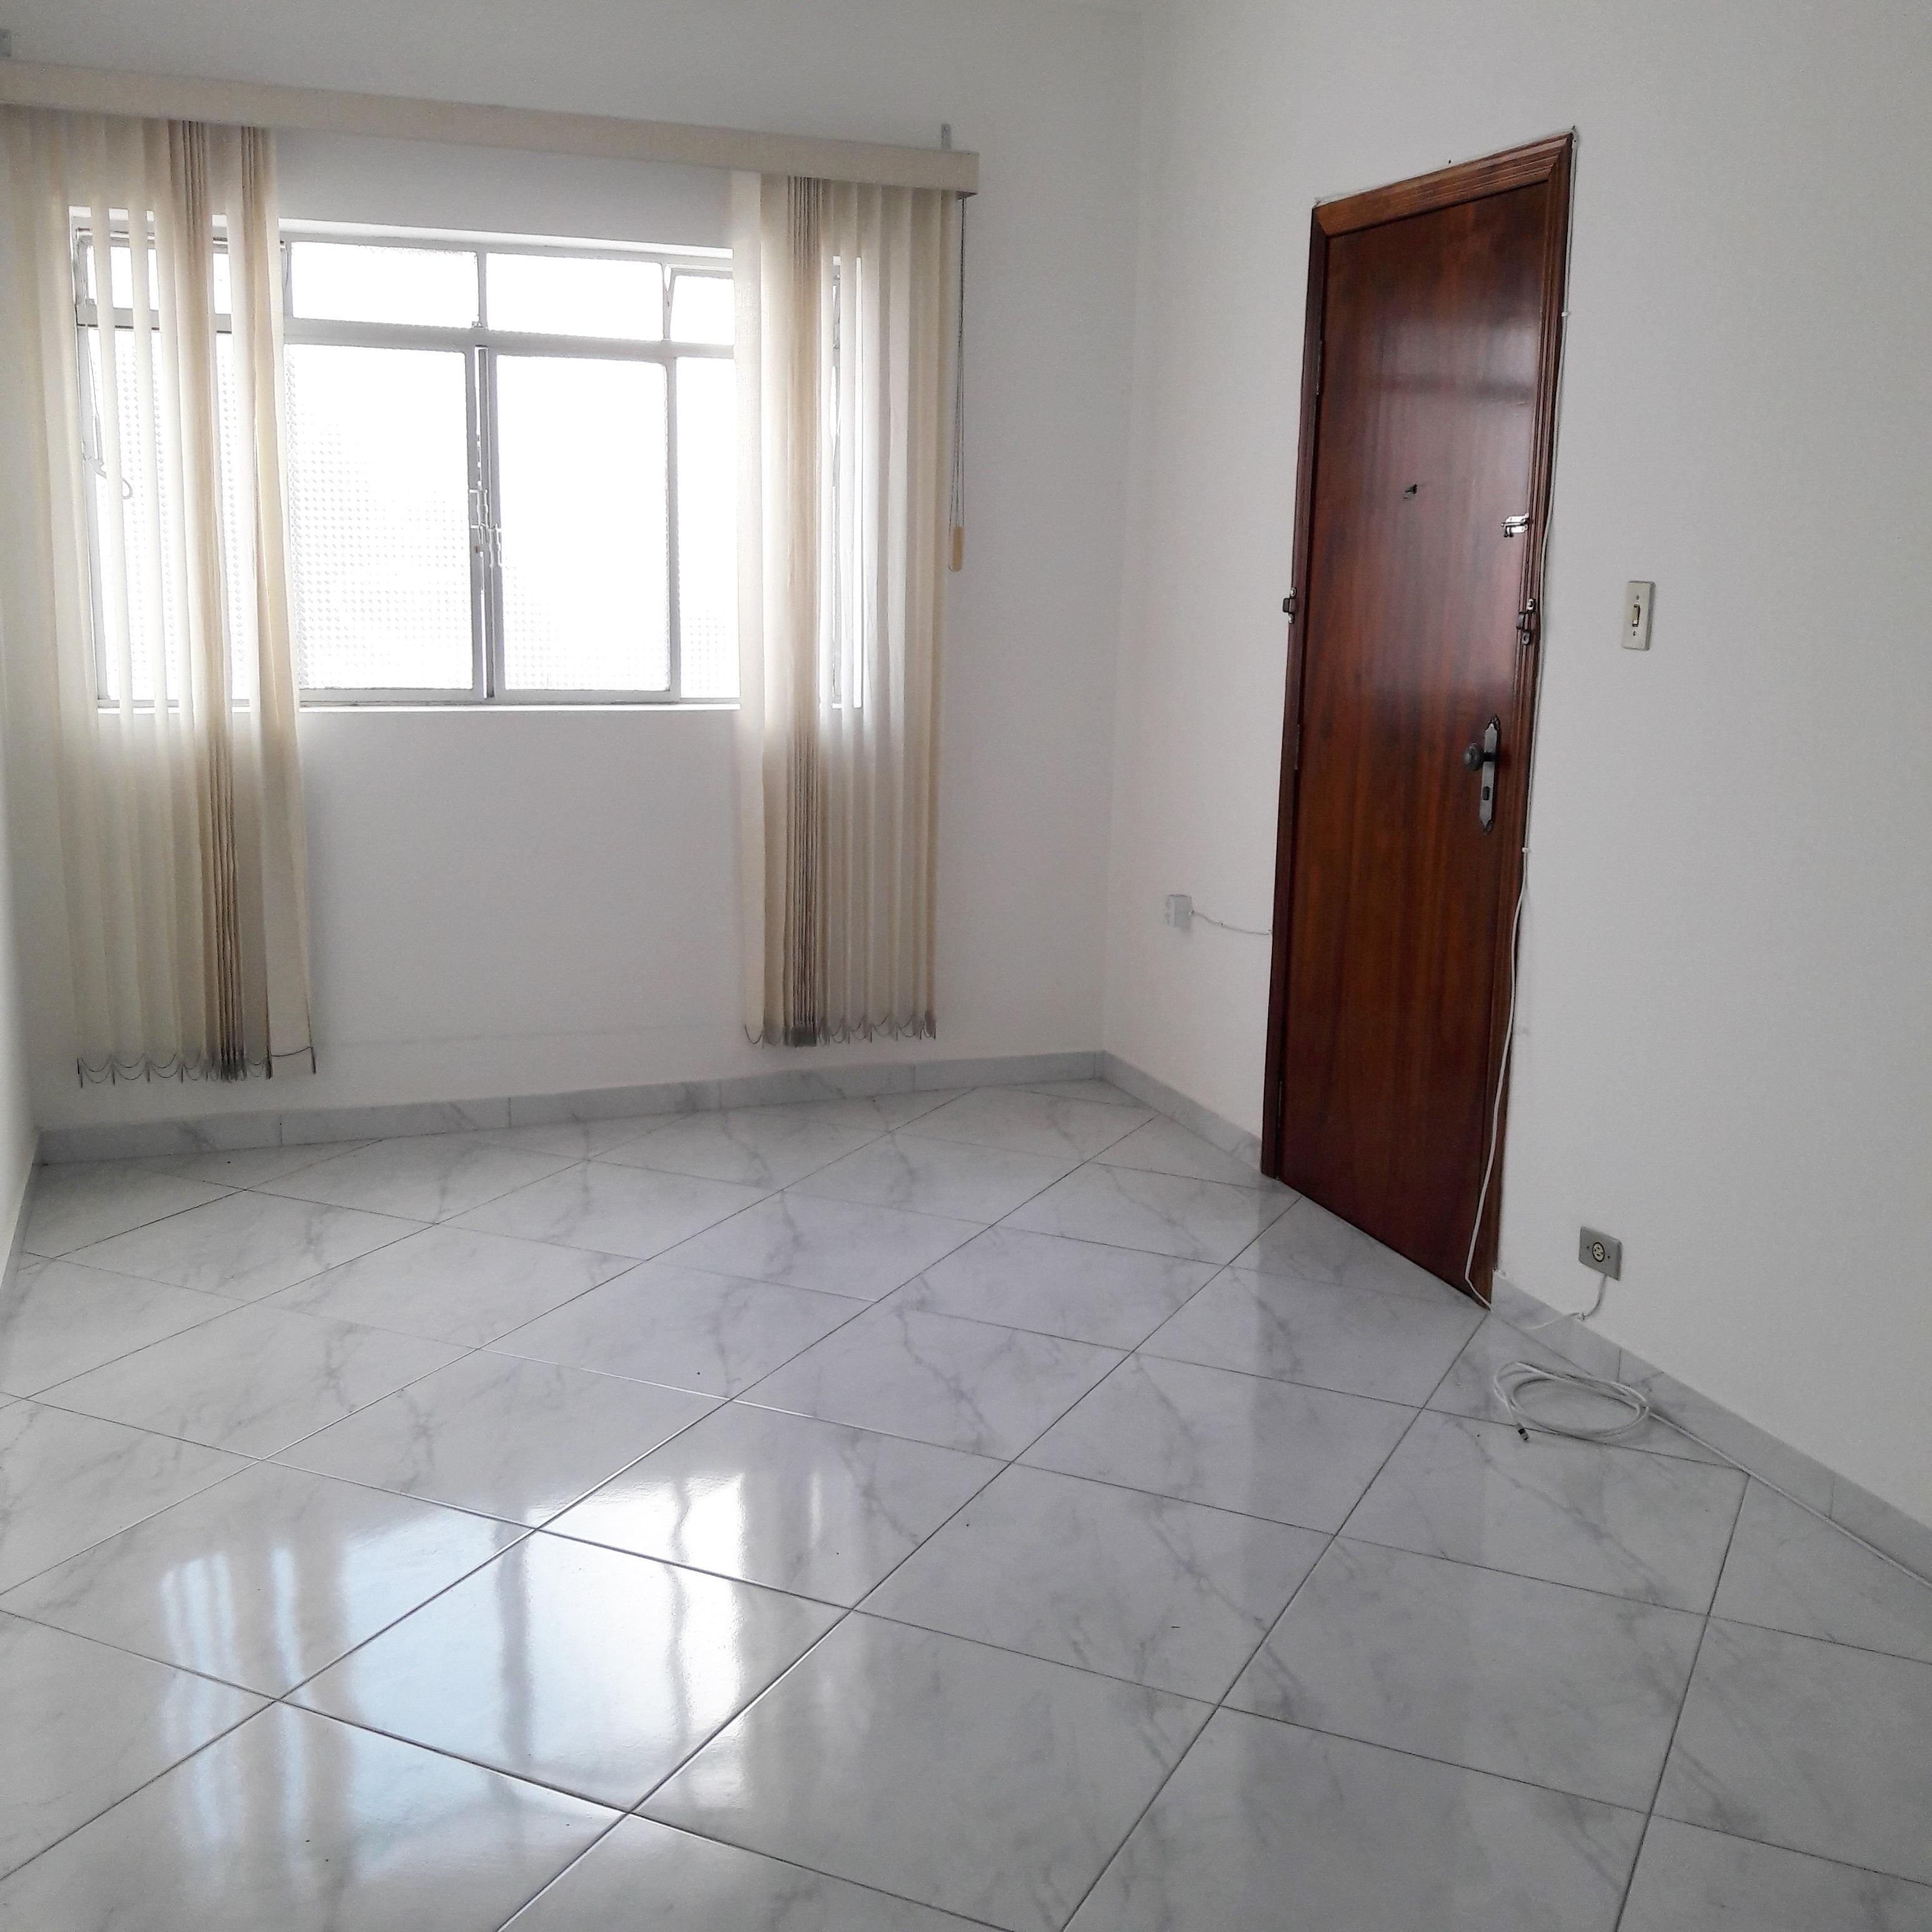 Alugo- Residencial / Comercial -Referencia: 4296